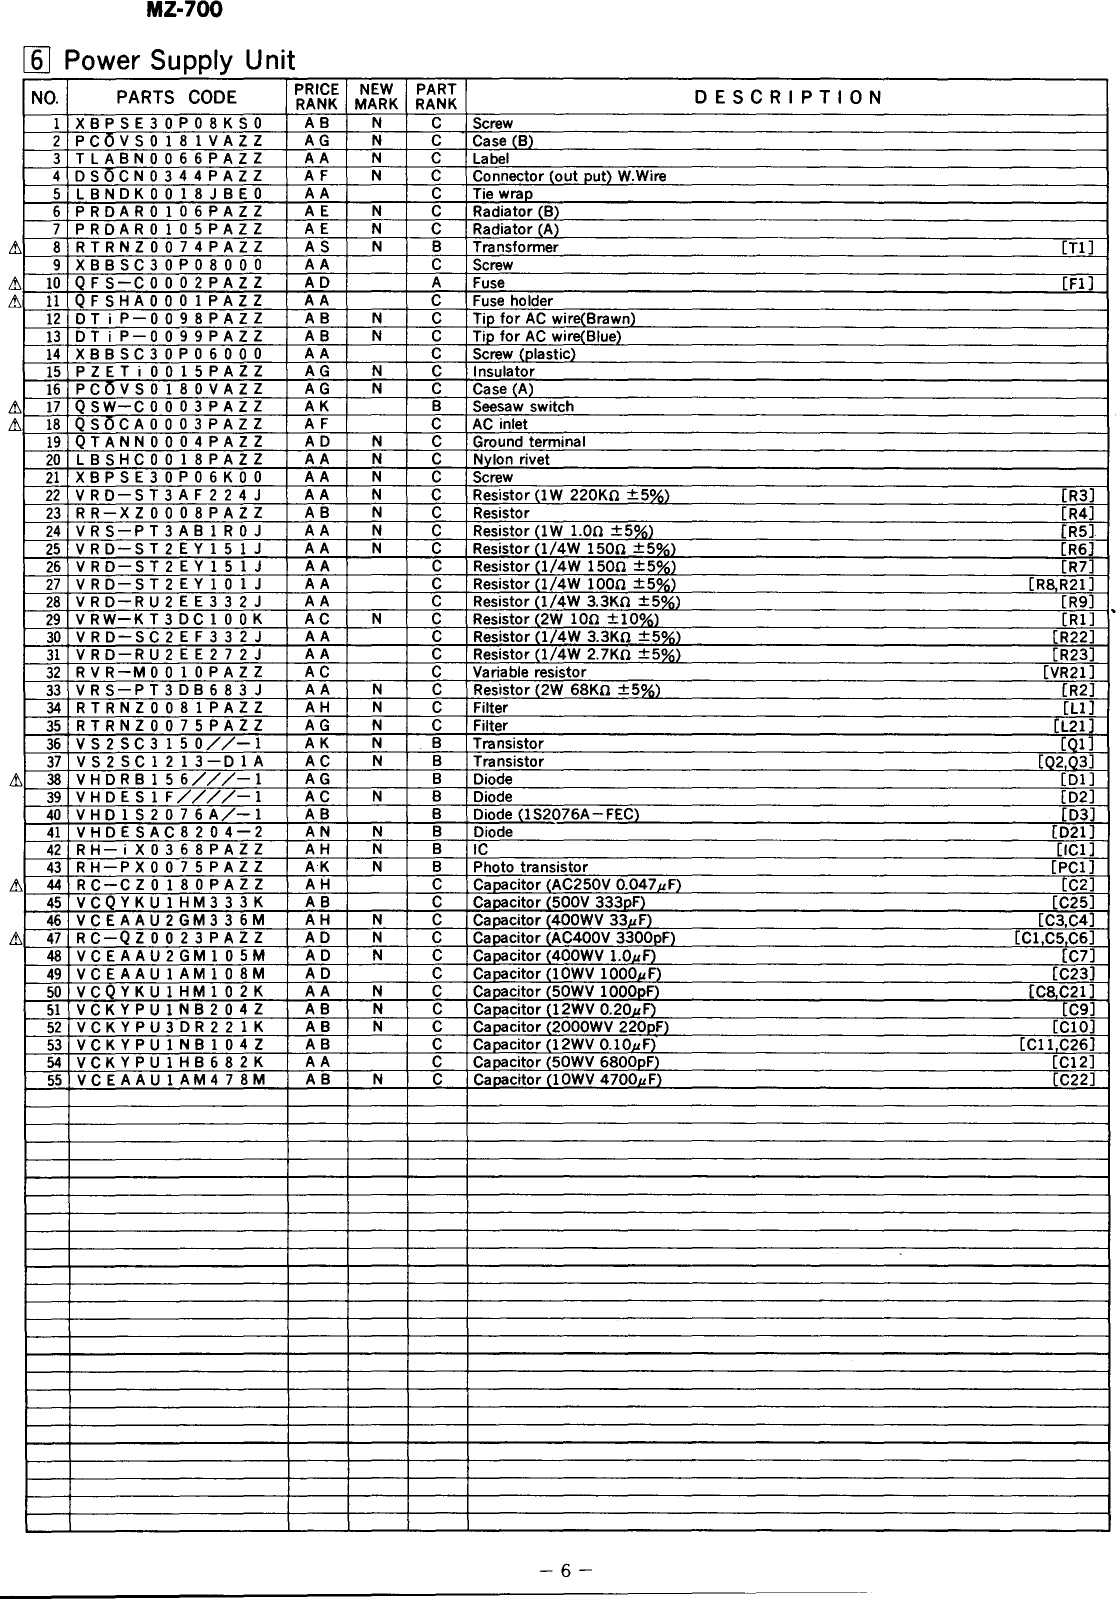 Sharp Personal Computer Mz 700 Users Manual Service